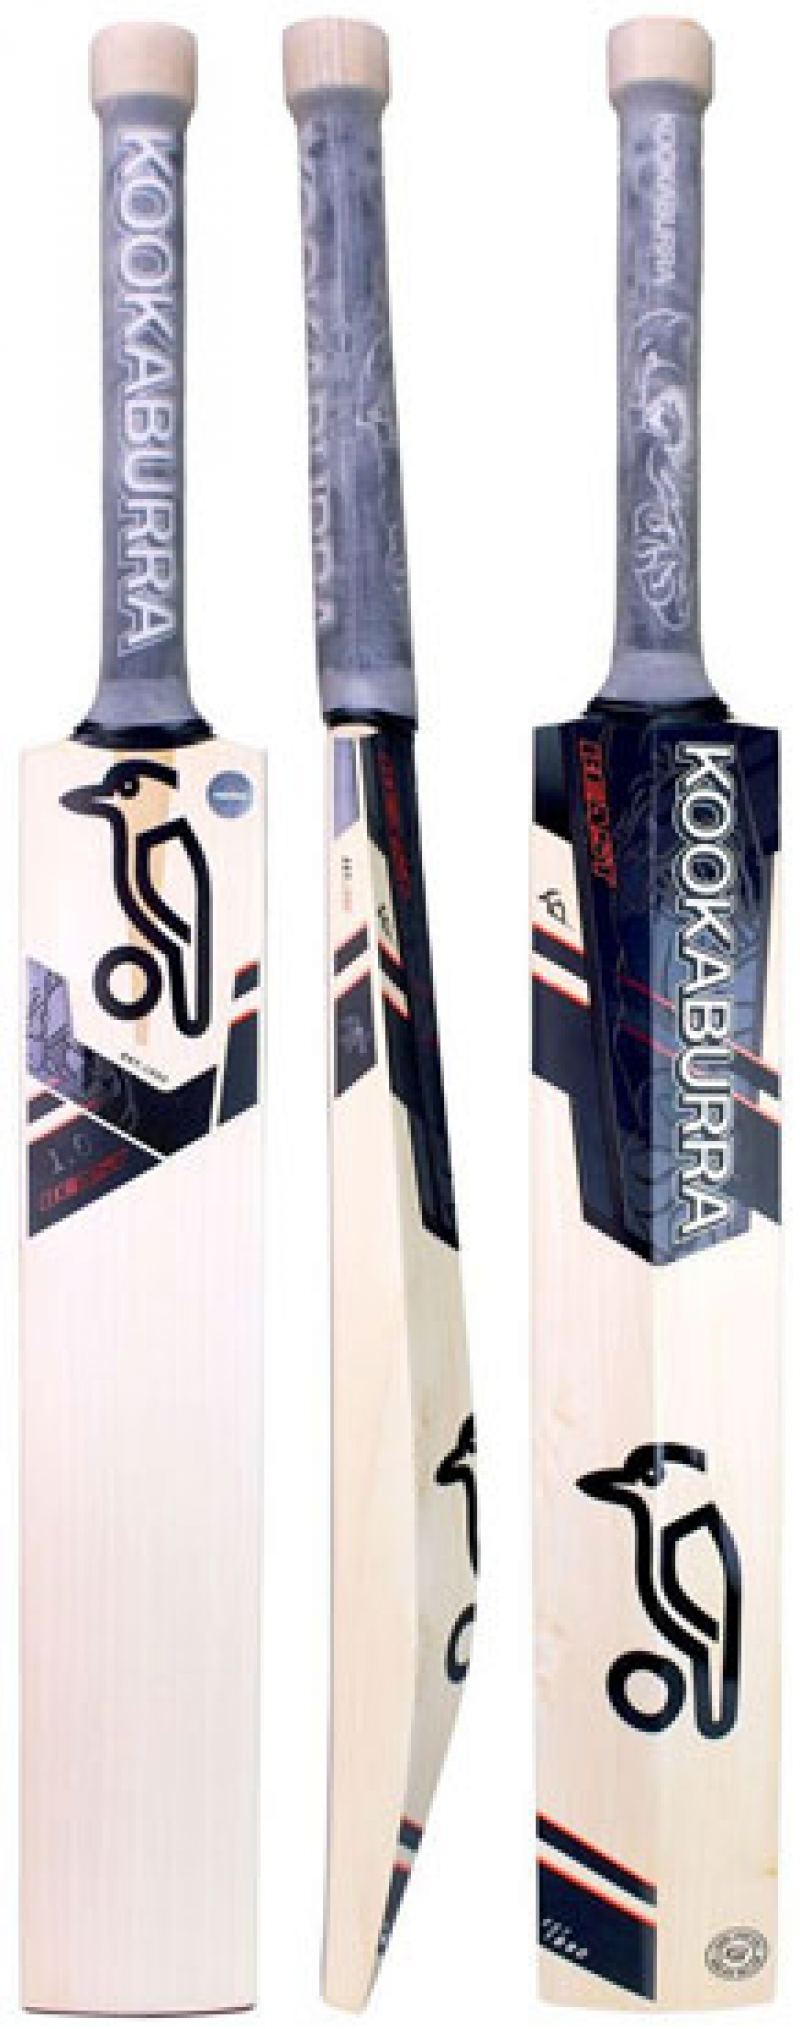 Kookaburra Beast 1.0 Cricket Bat